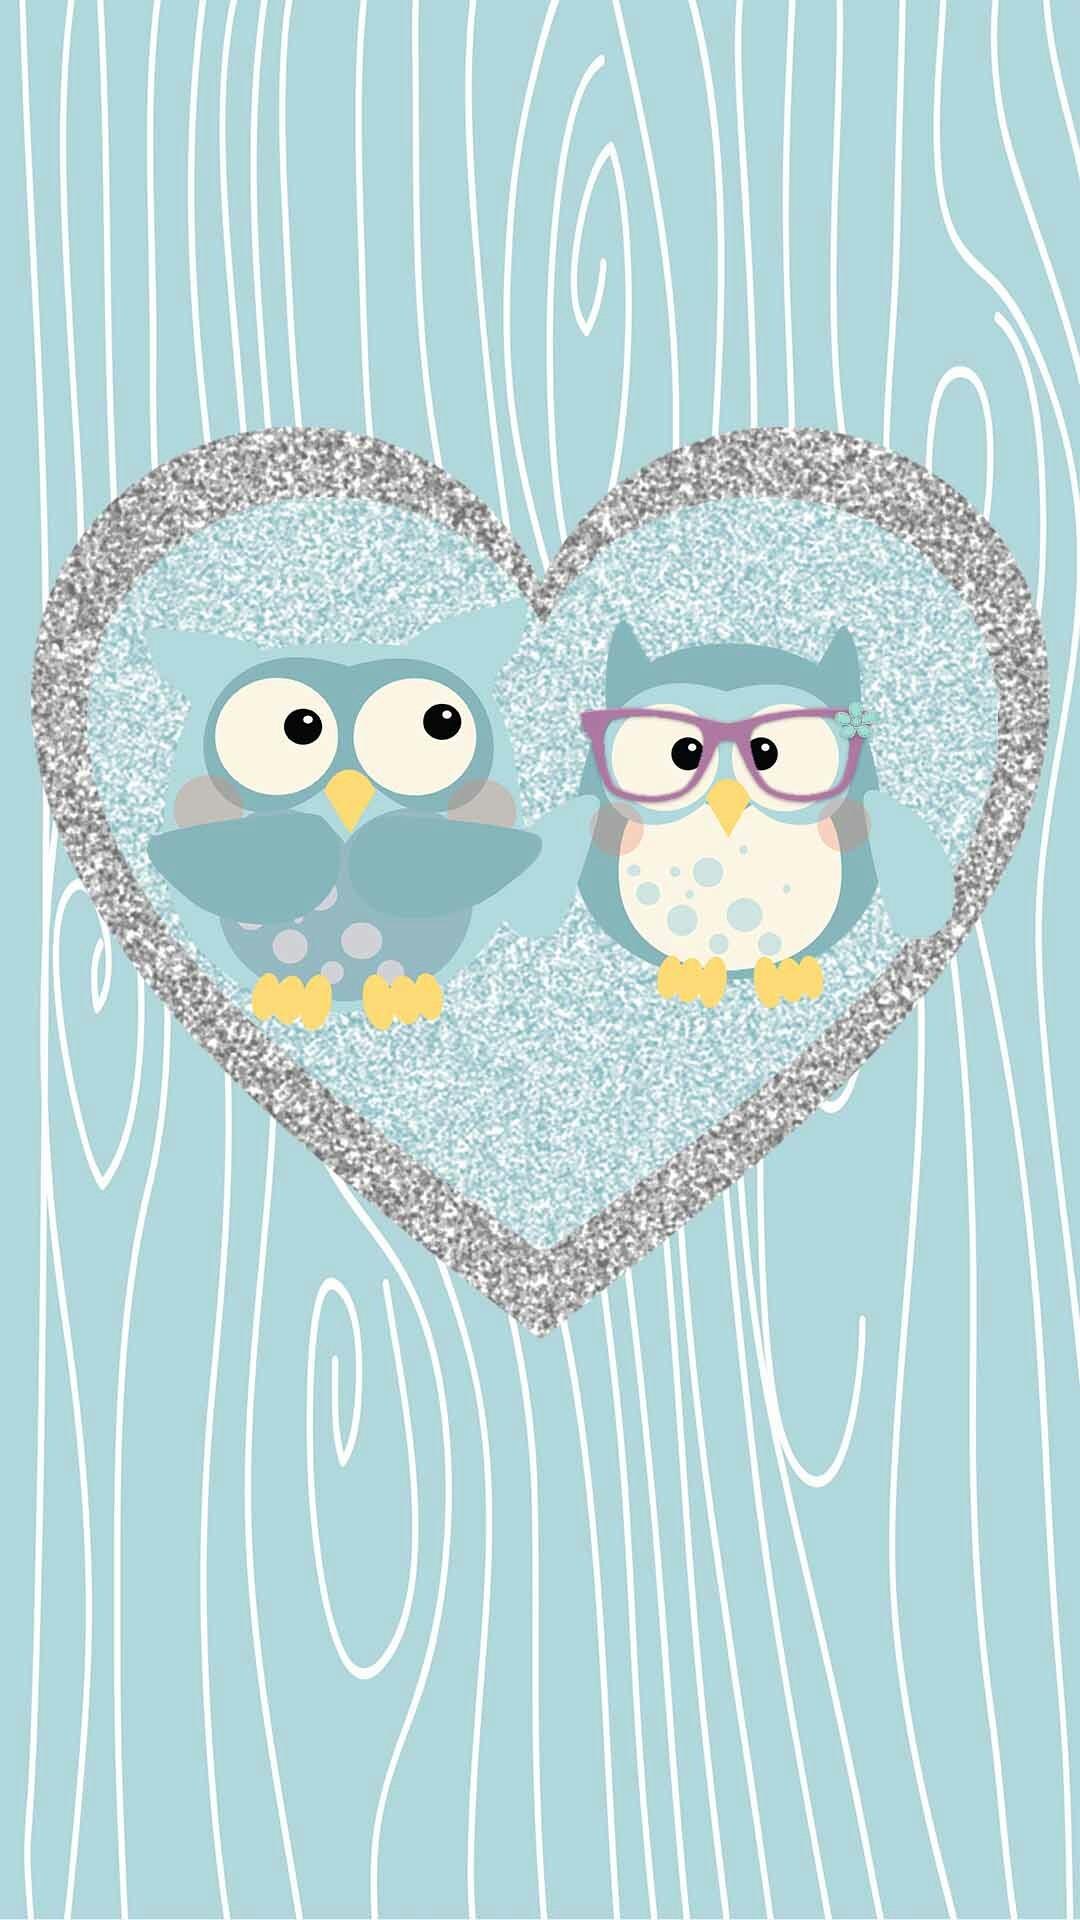 Owl wallpaper. Owl WallpaperCartoon WallpaperOwl SchoolCute …